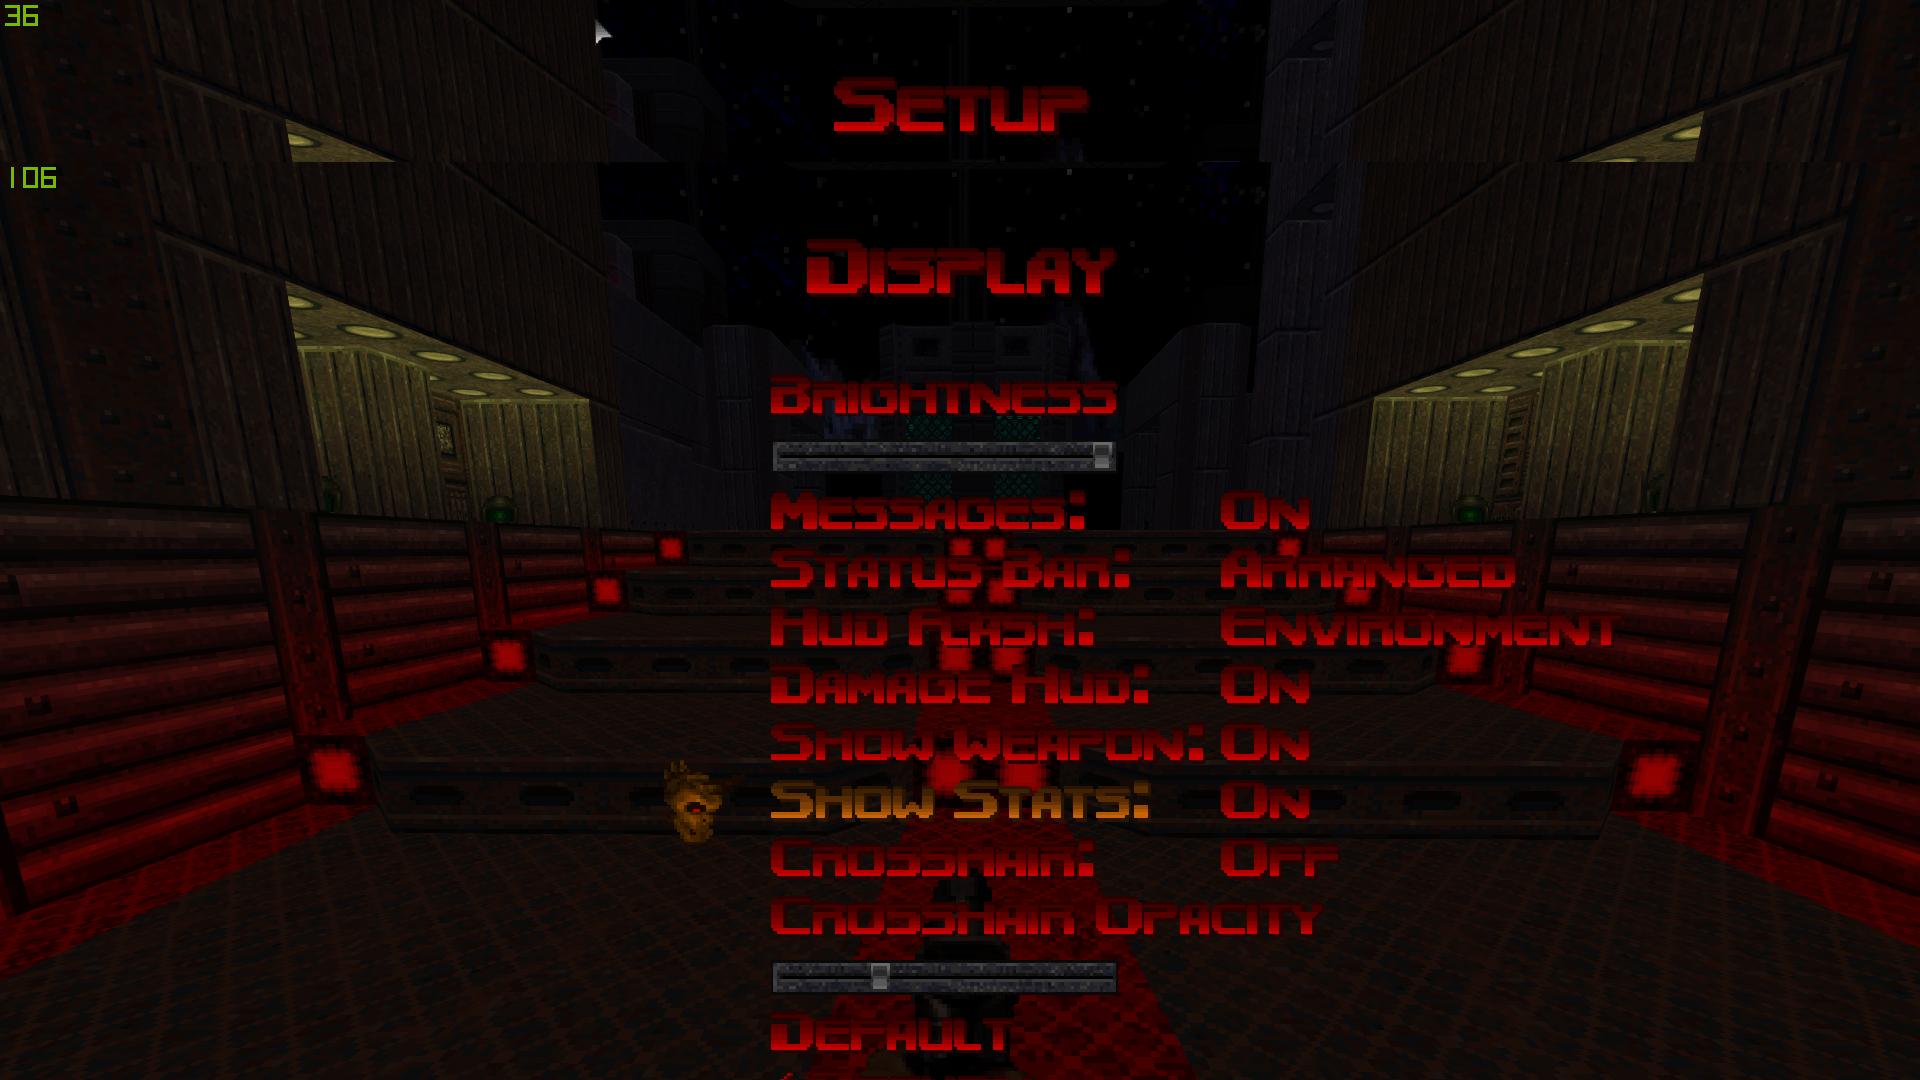 Doom_64_EX_3.png.96cf73dcbb35ae36eec8f933a225eb8f.png